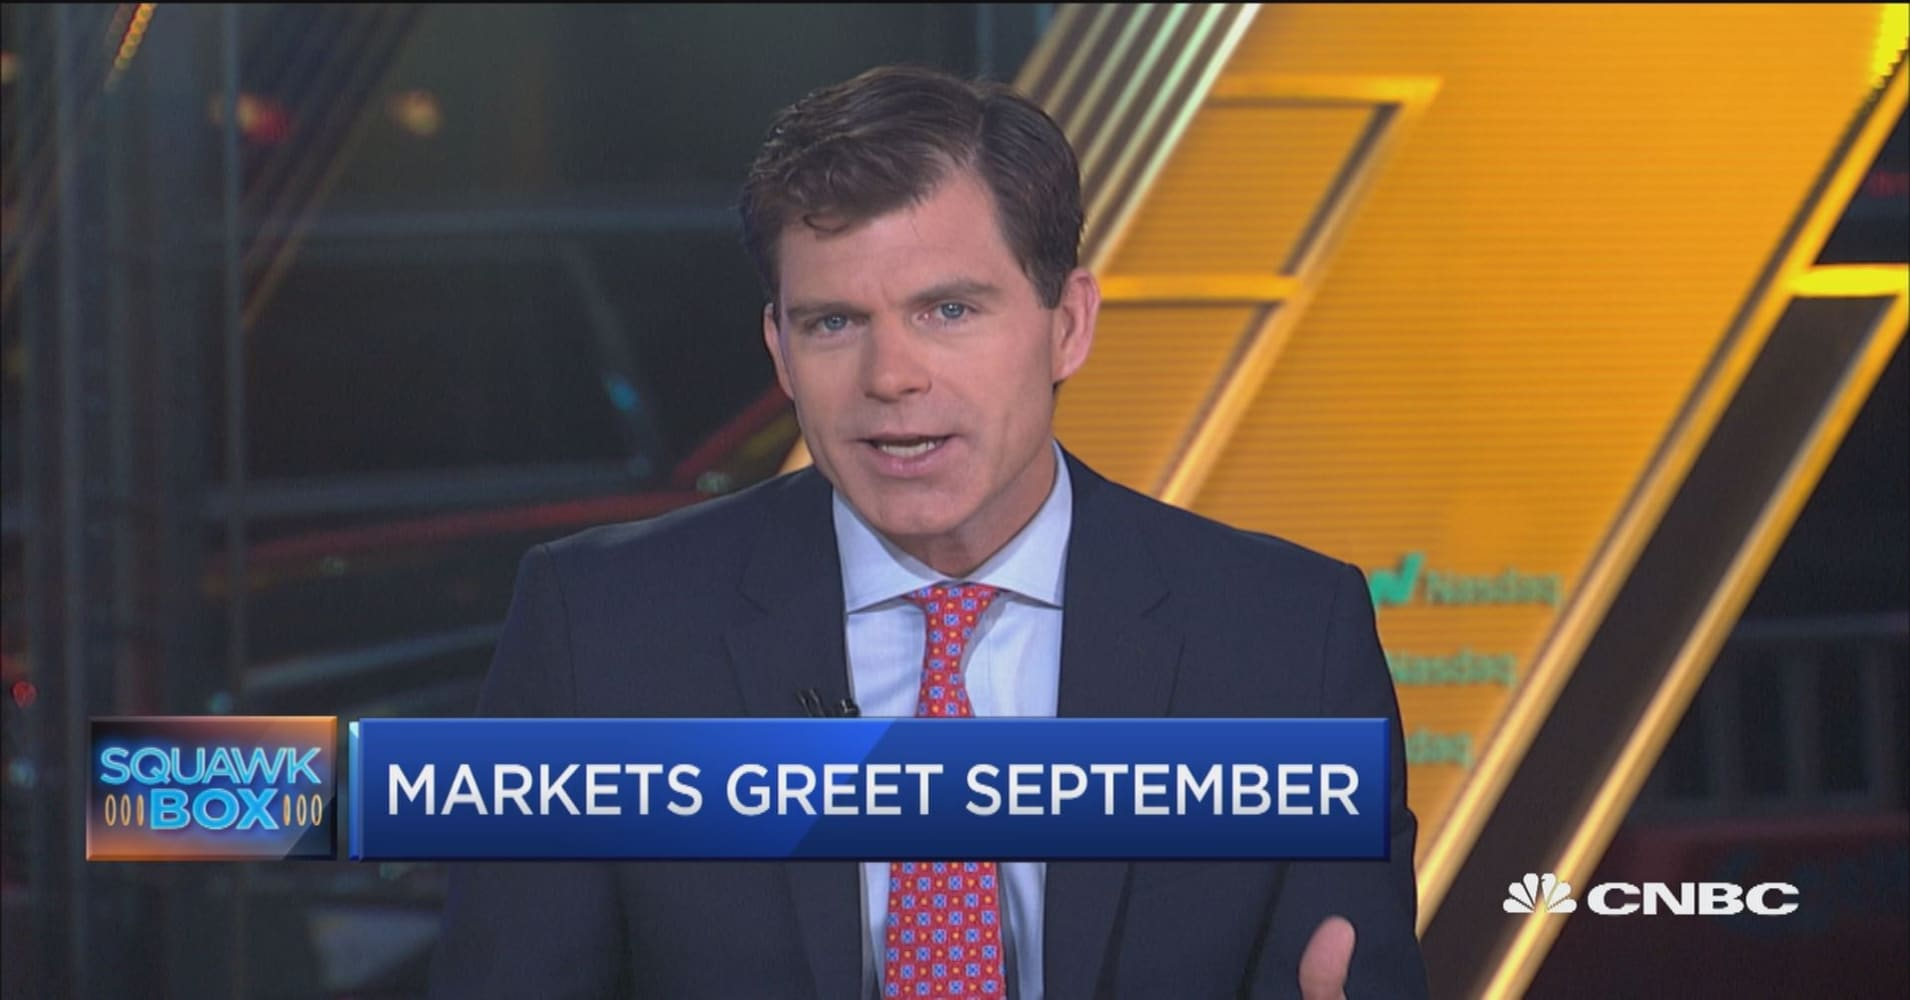 Markets Ready To Greet Sober September